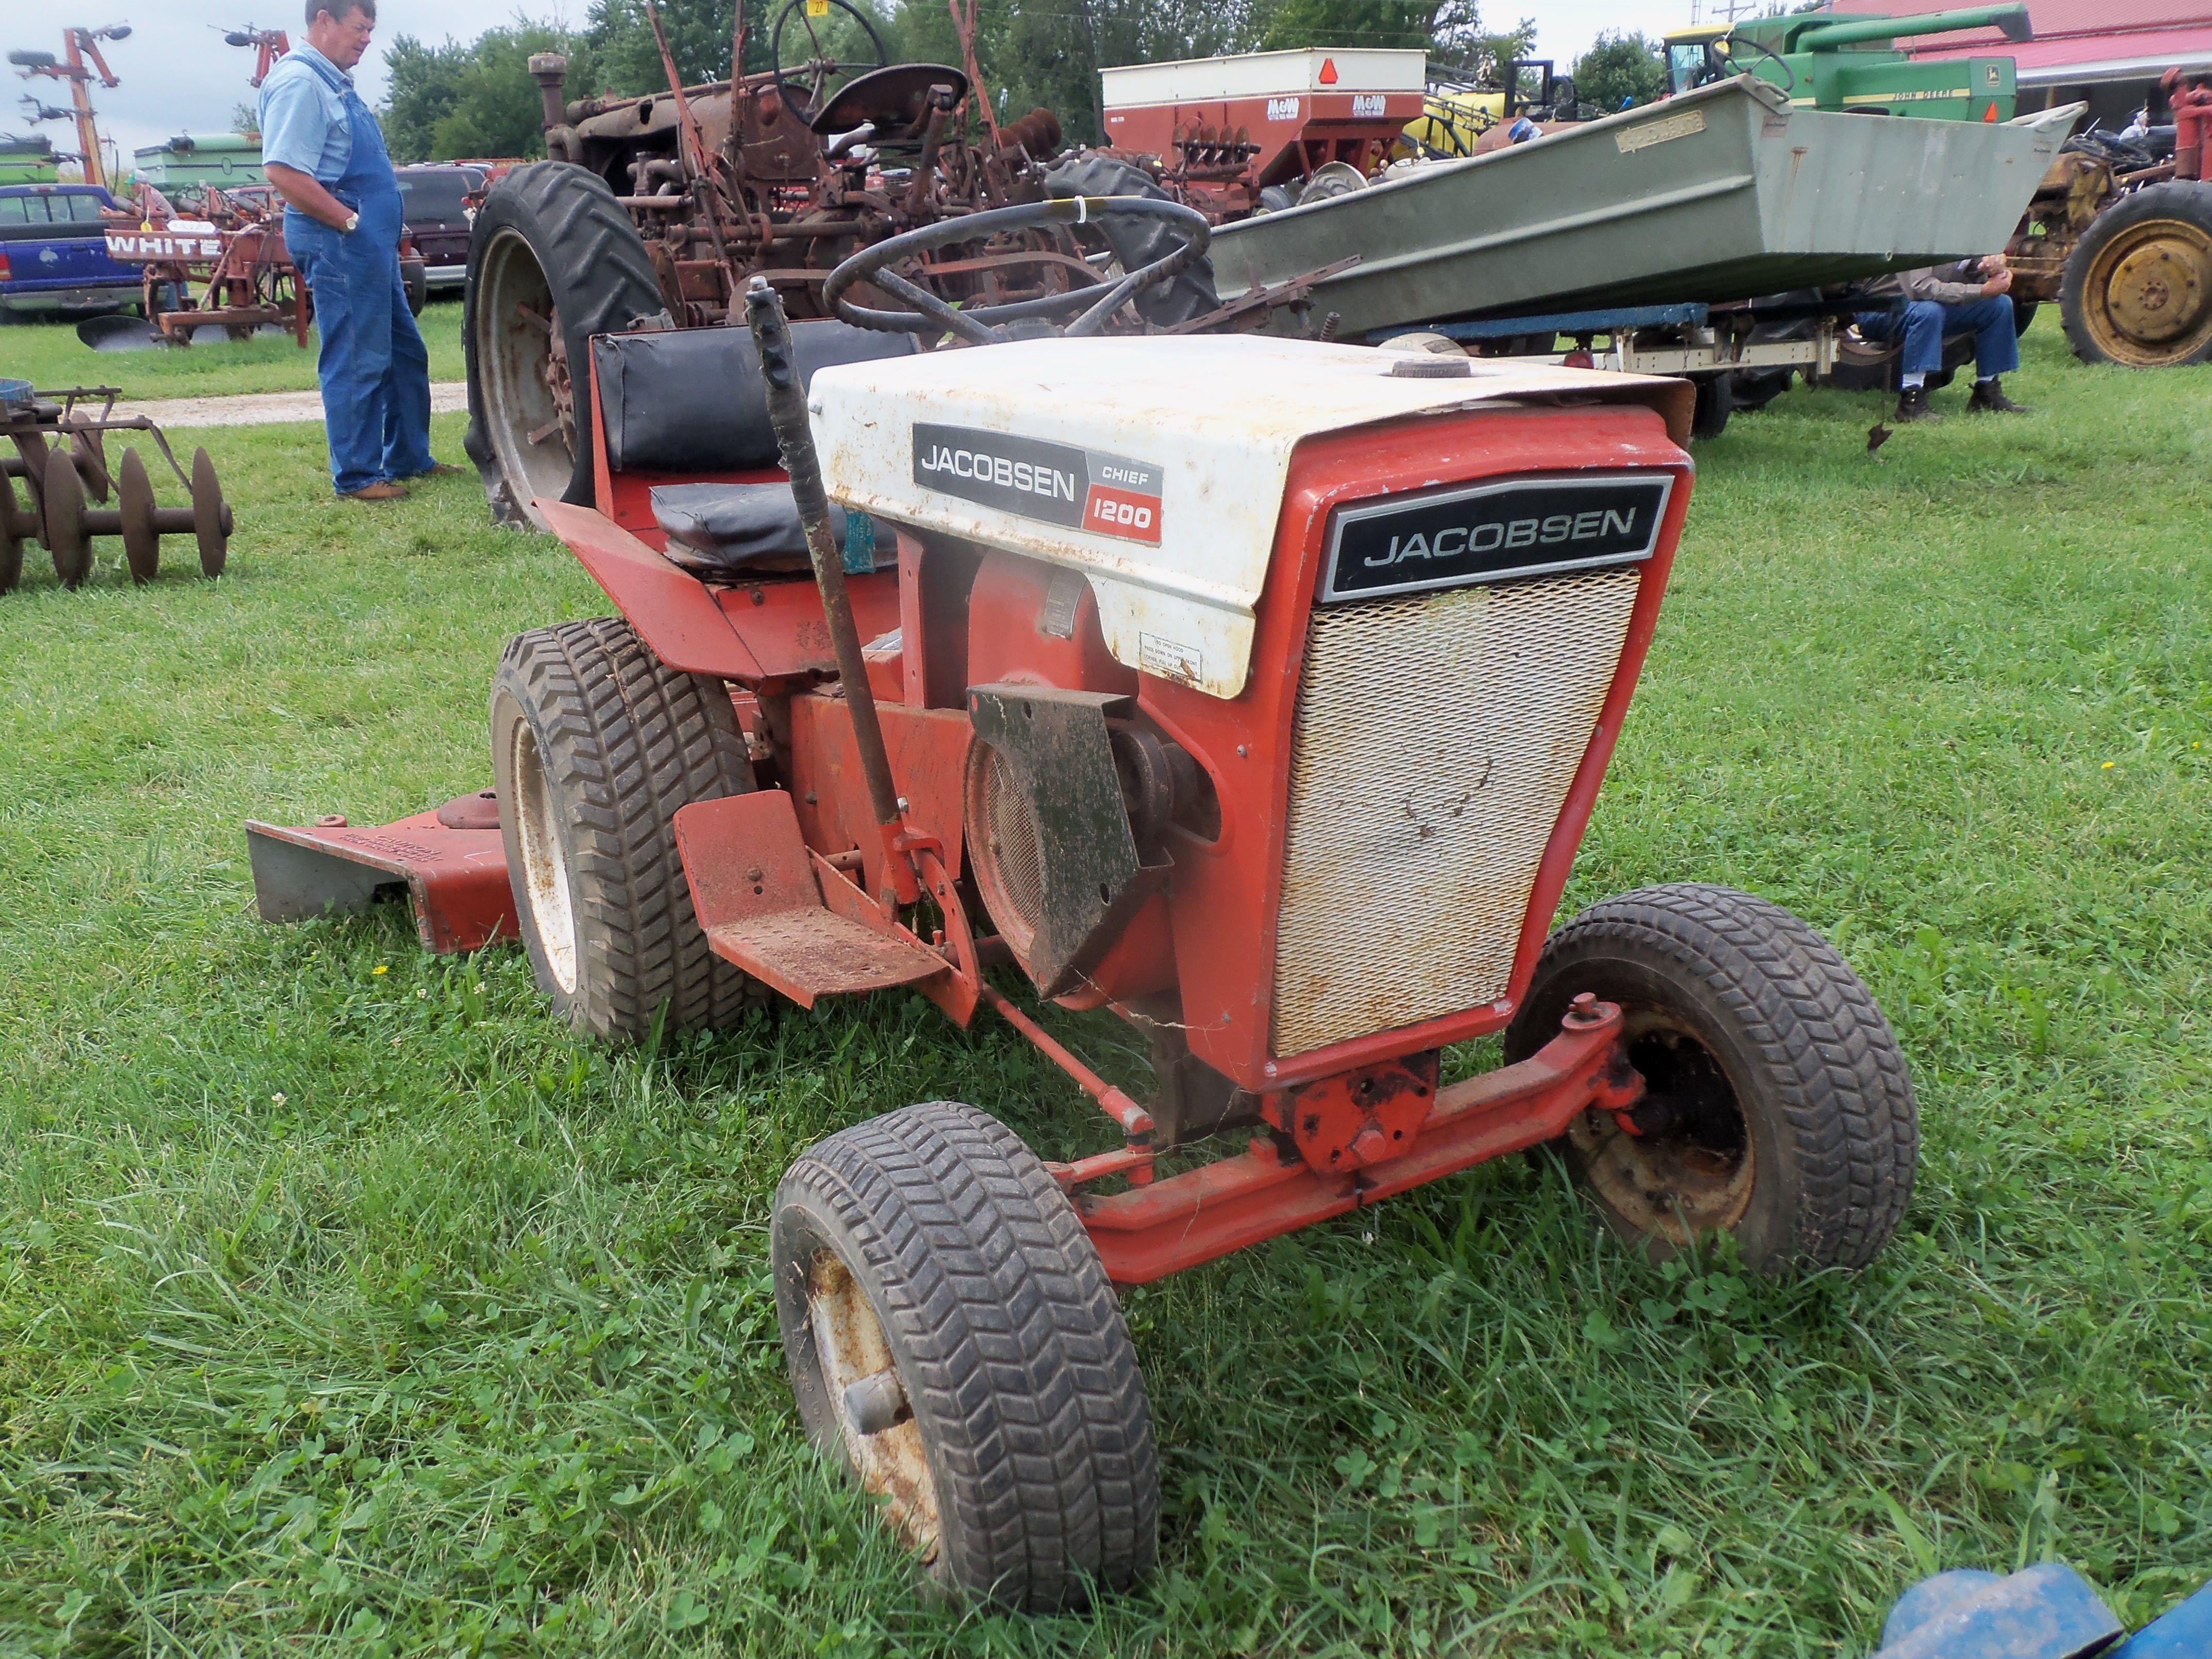 Jacobson 1200 Lawn Garden Tractor Garden Tractor Lawn Tractor